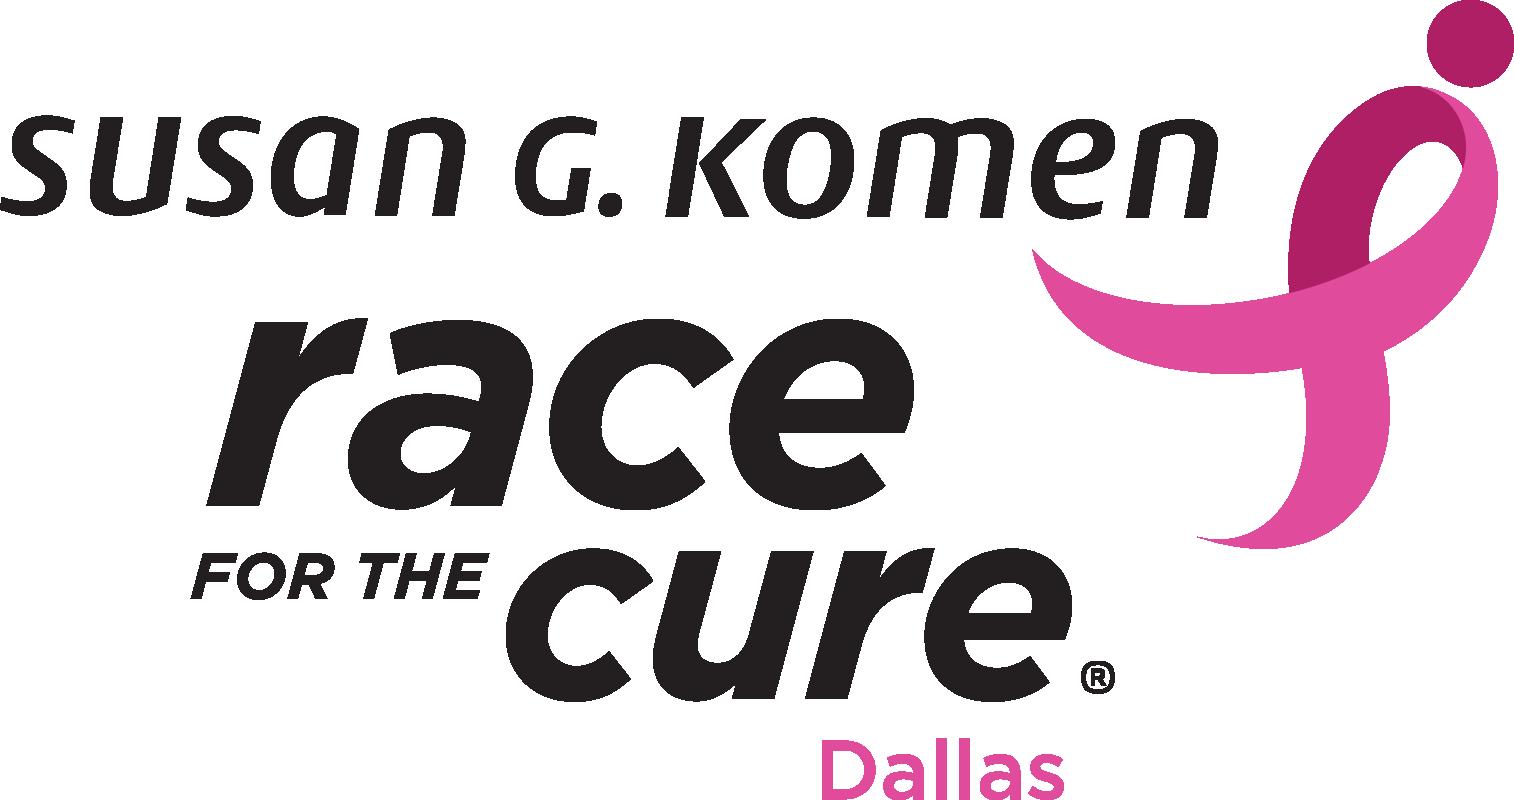 SGK RaceCure Logo 2C+Blk - Dallas.png